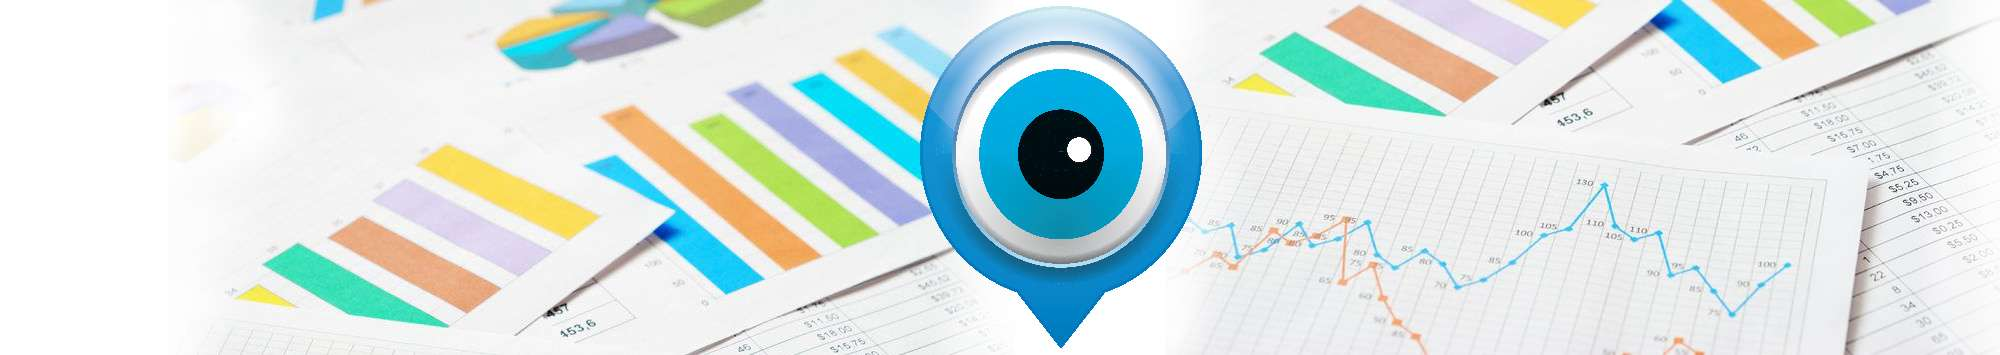 Klantenportaal - Traxgo Monitoring & tracking